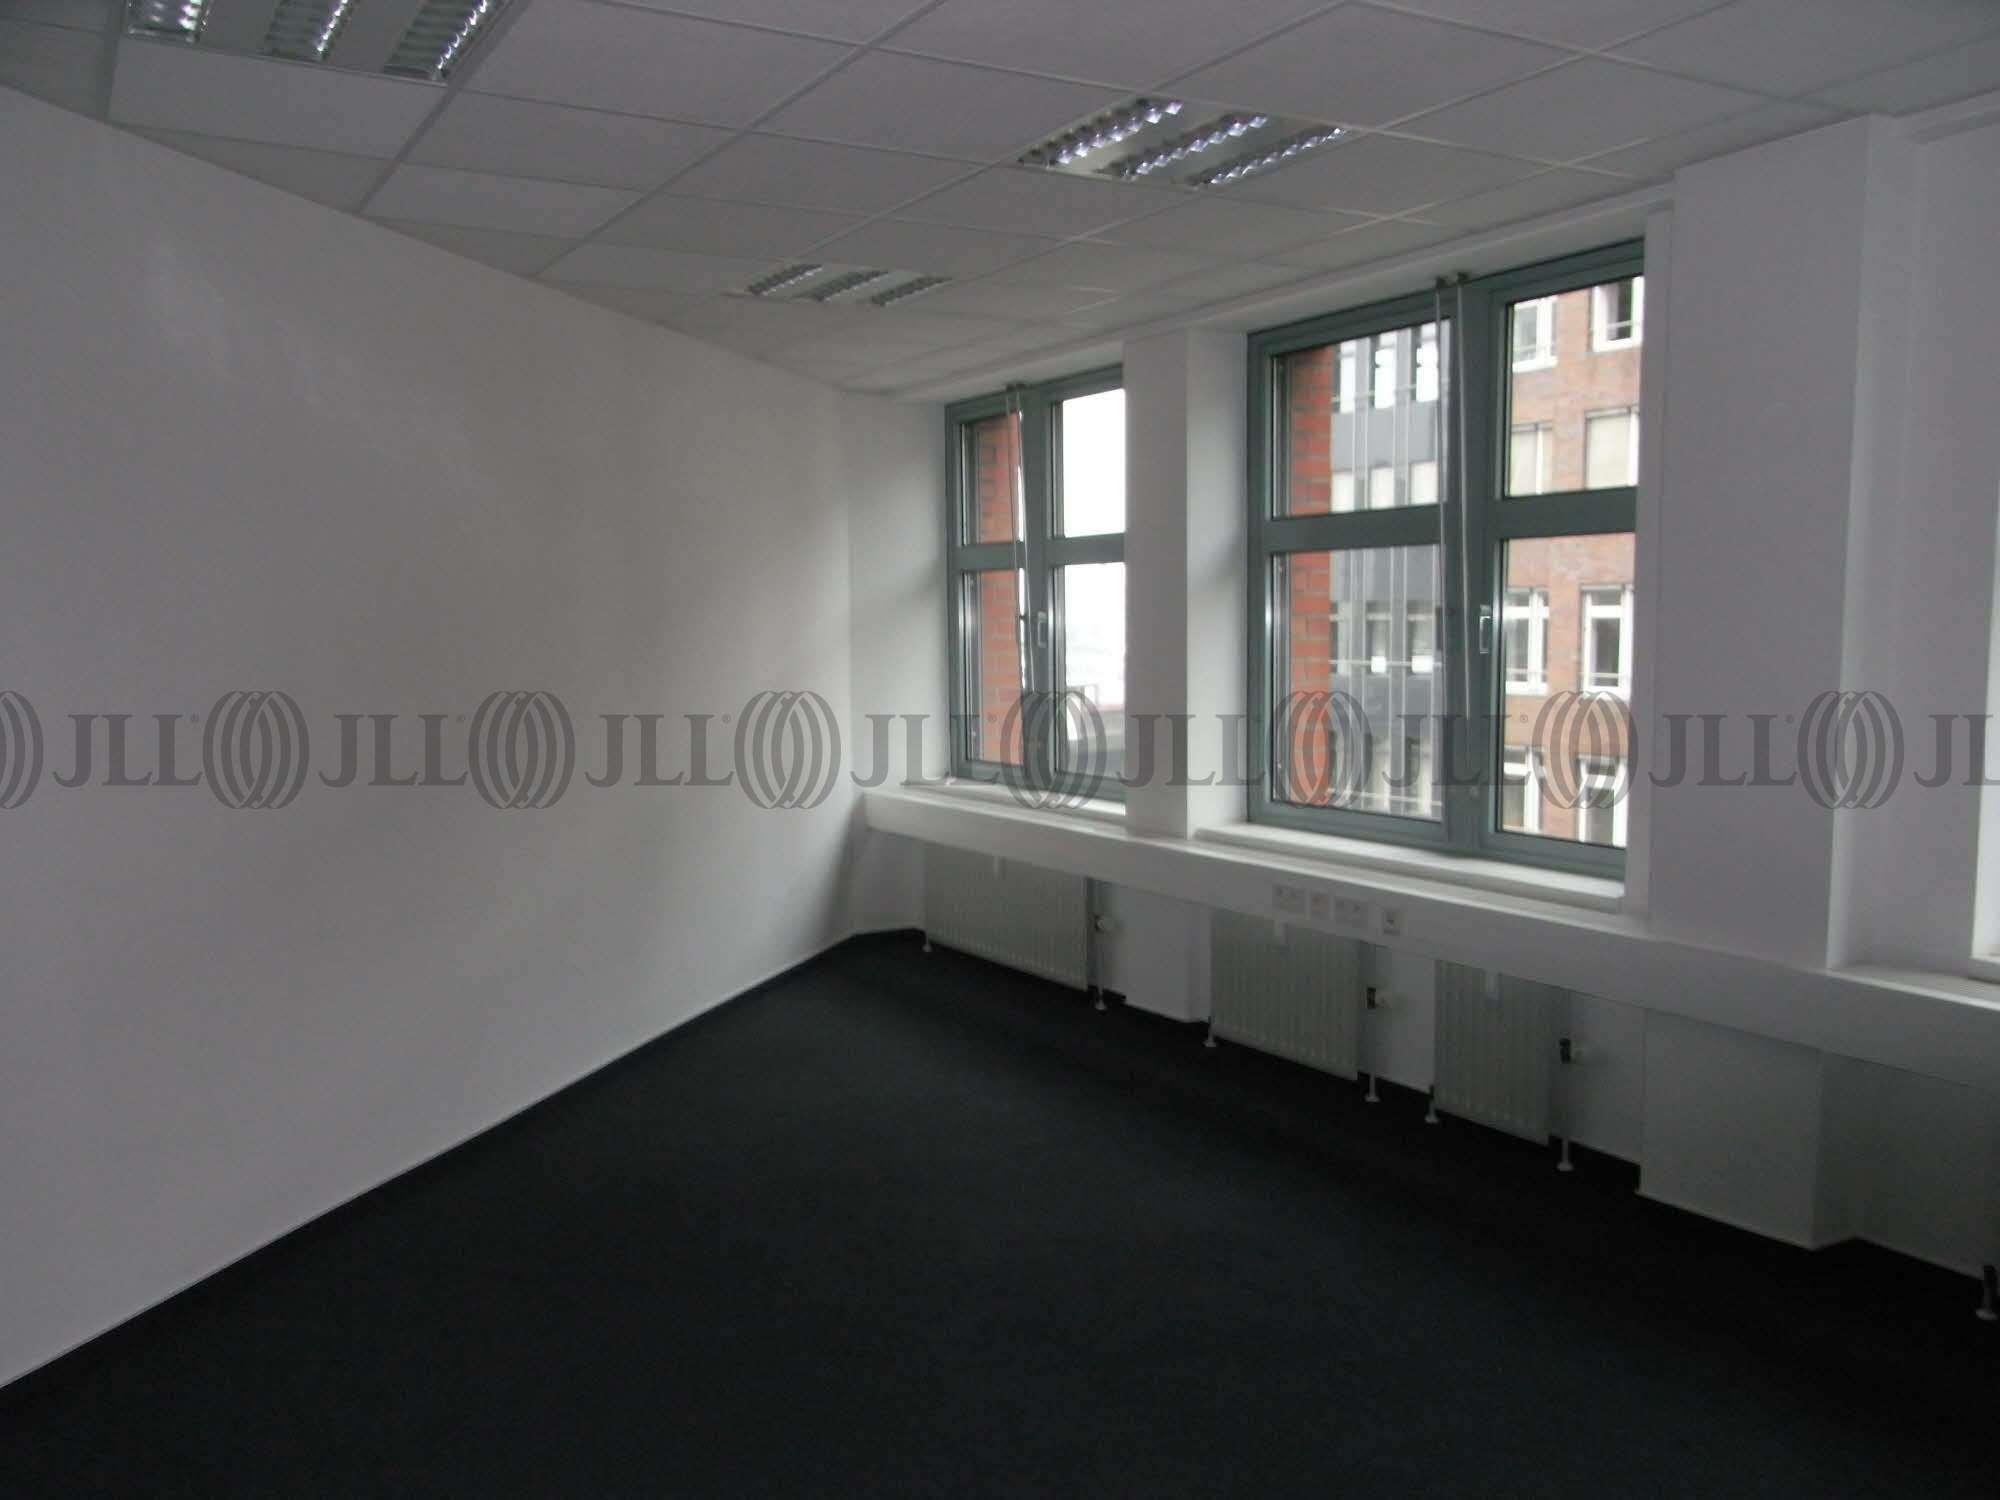 Büros Hamburg, 20459 - Büro - Hamburg, Neustadt - H0002 - 9397006